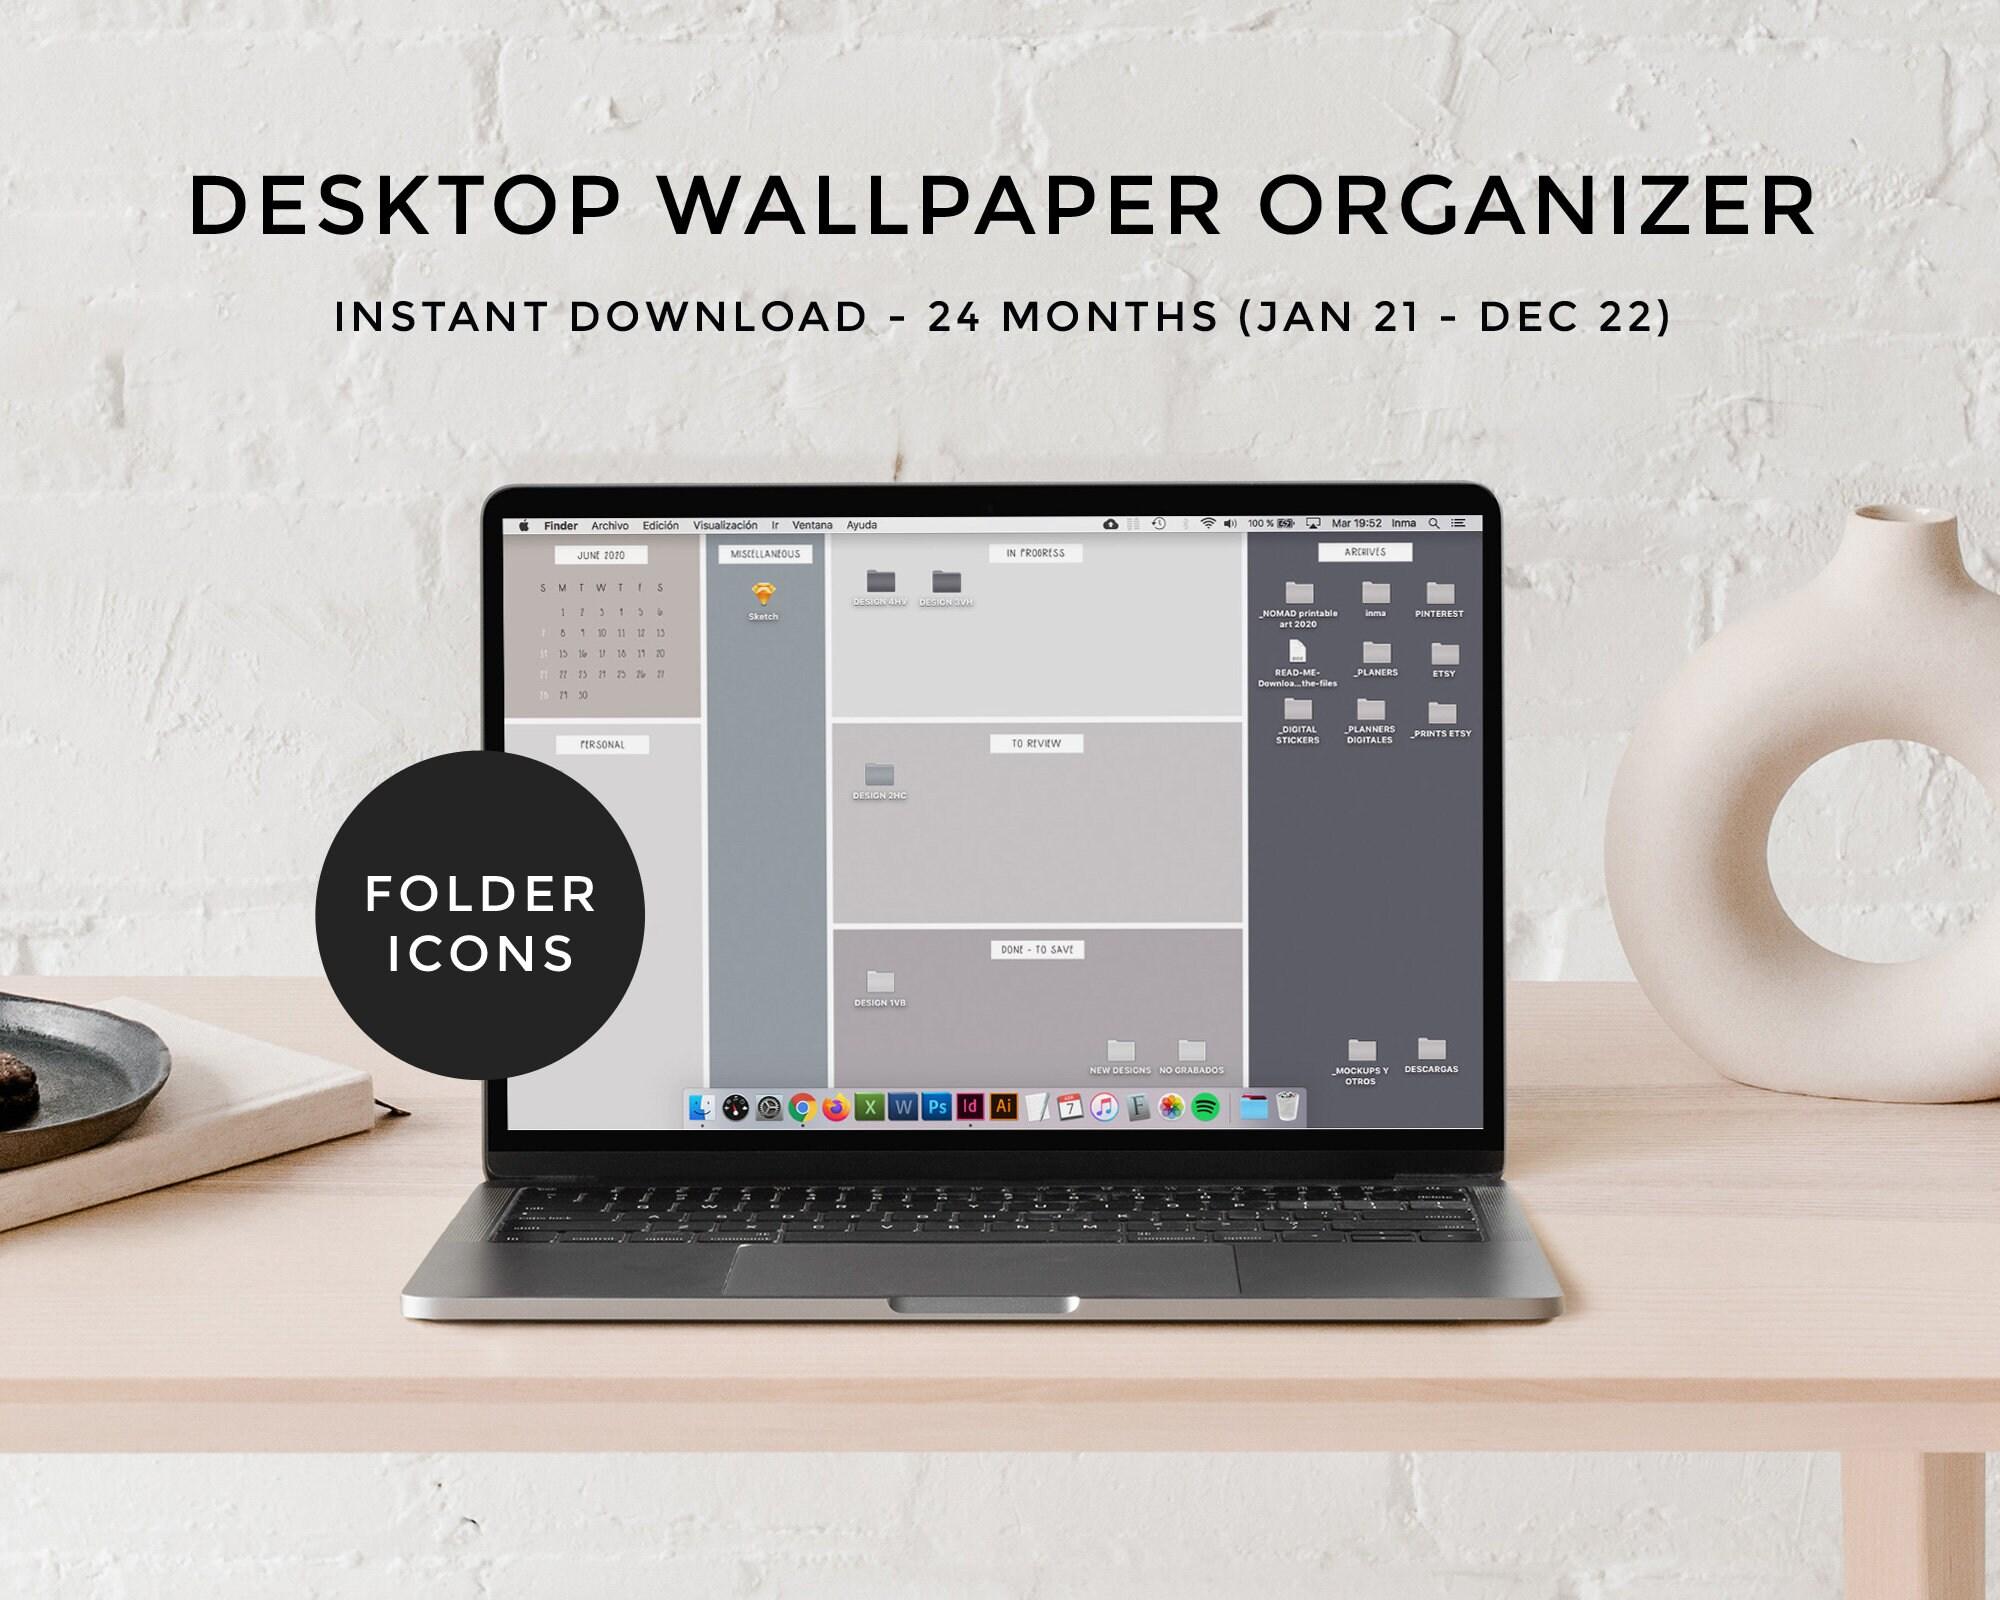 Desktop wallpaper organizer calendar 2021 2022 Minimalist Etsy 2000x1600